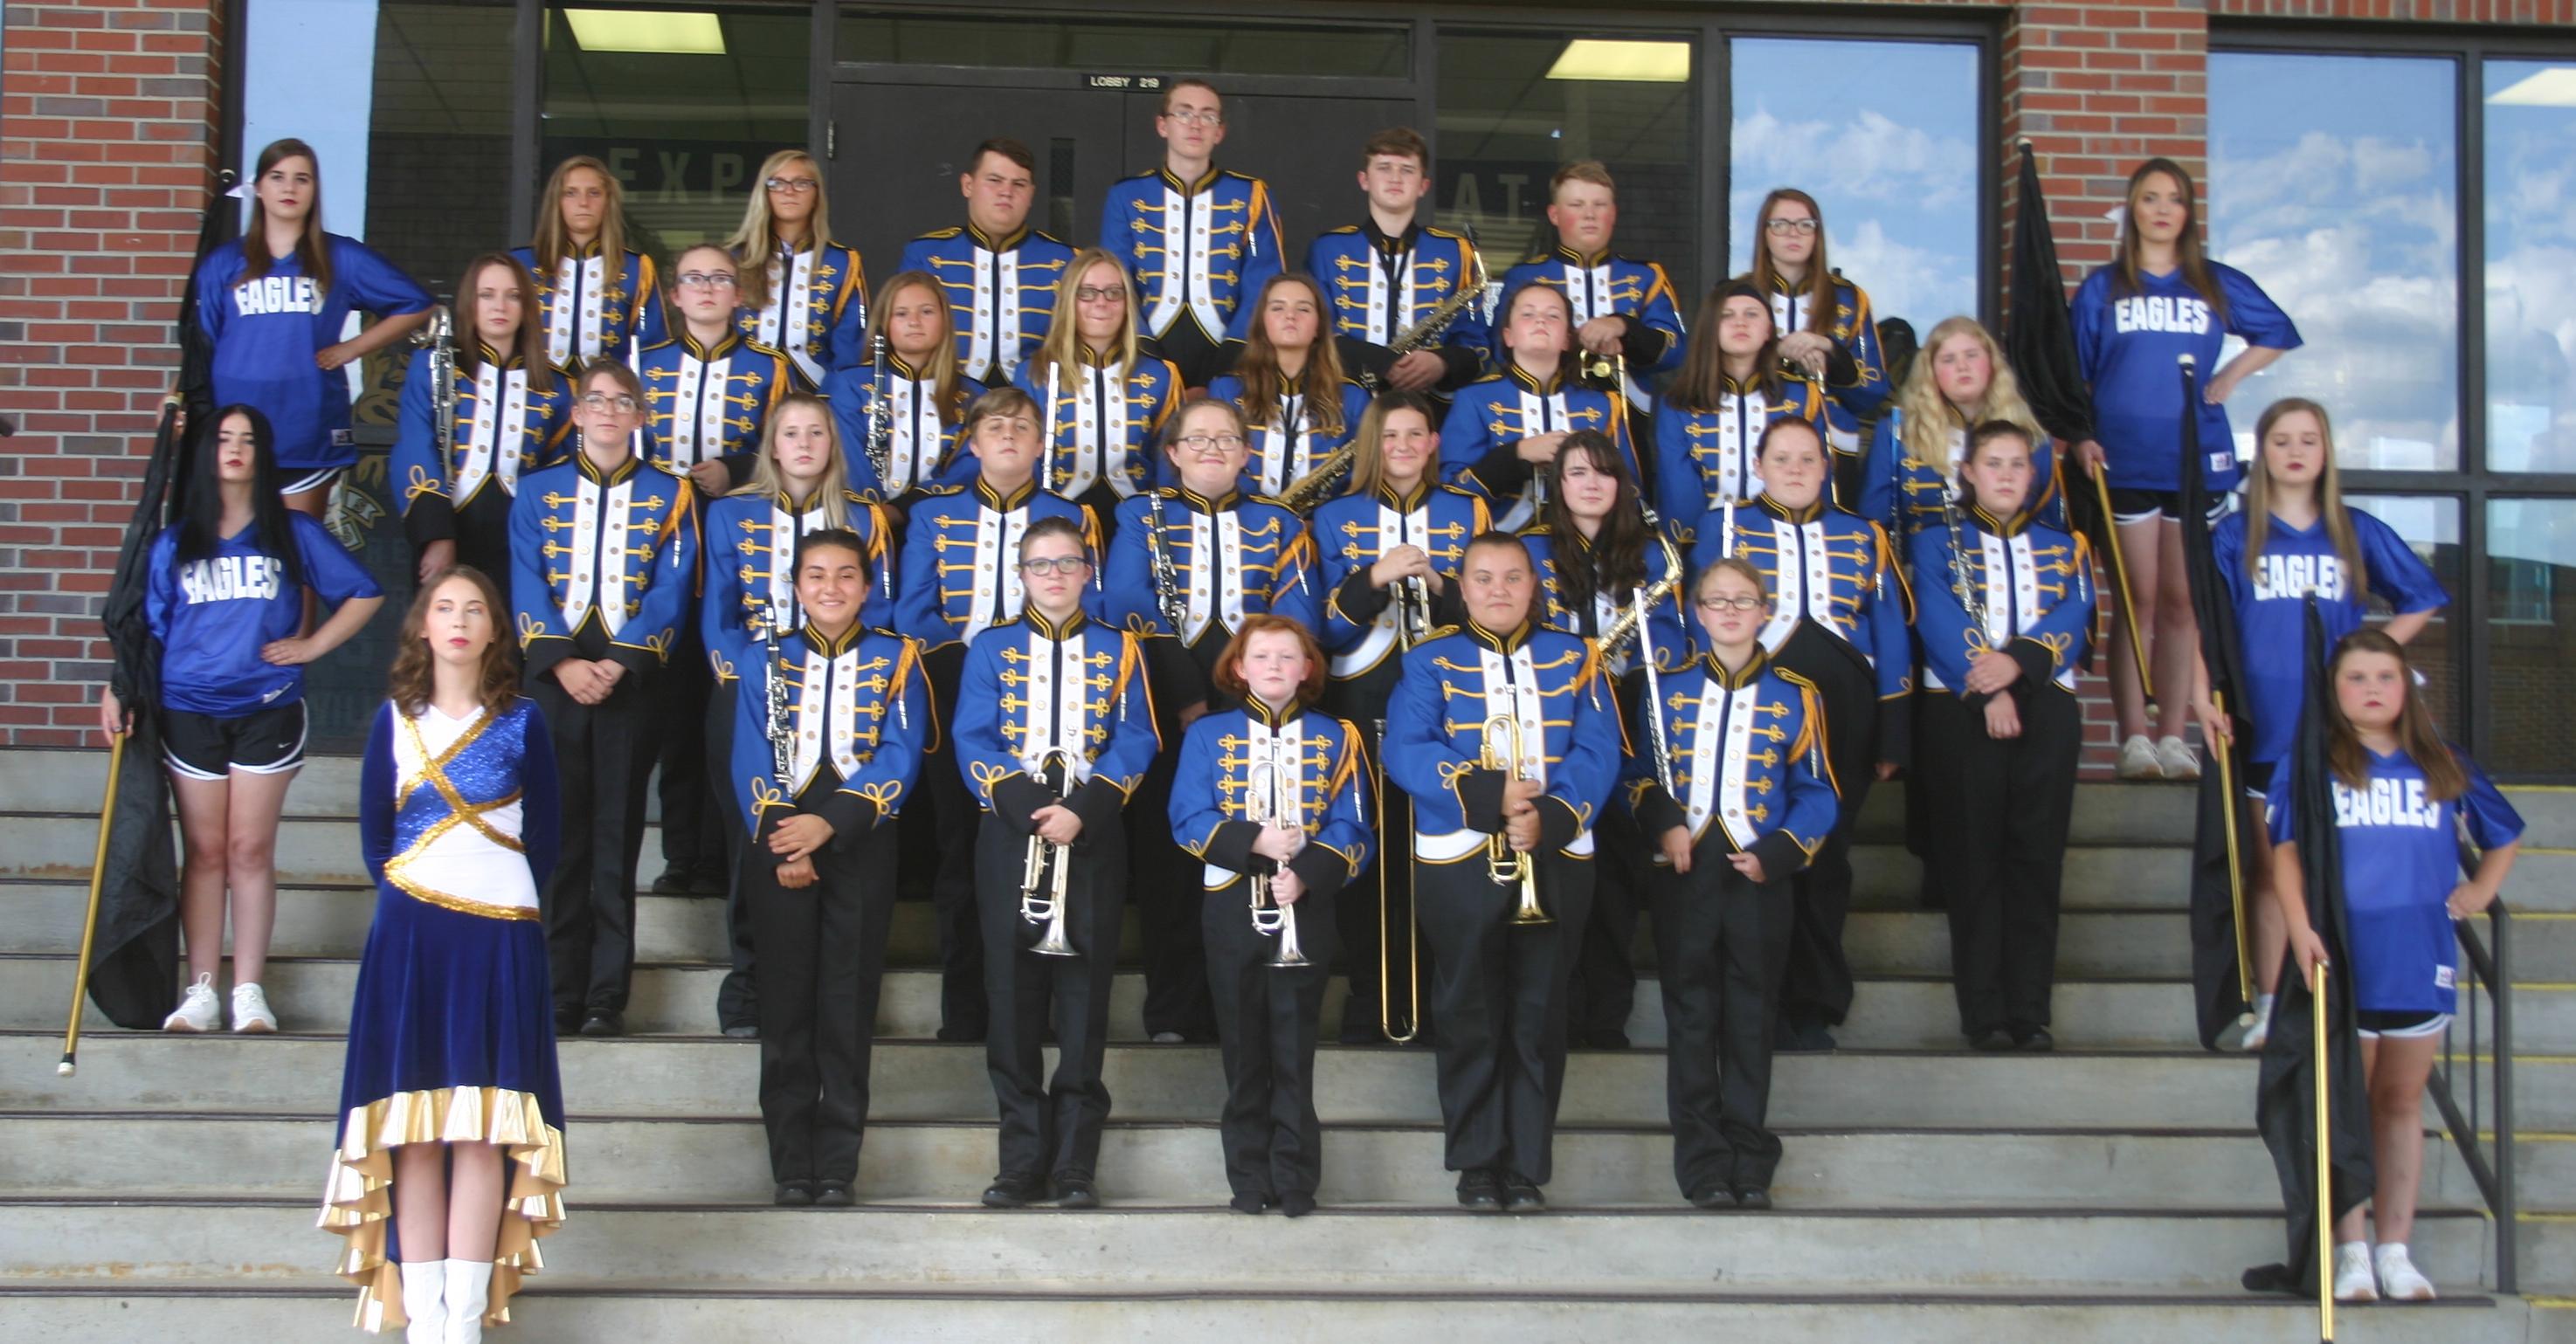 2020-21 Cold Springs Royal Blue Band